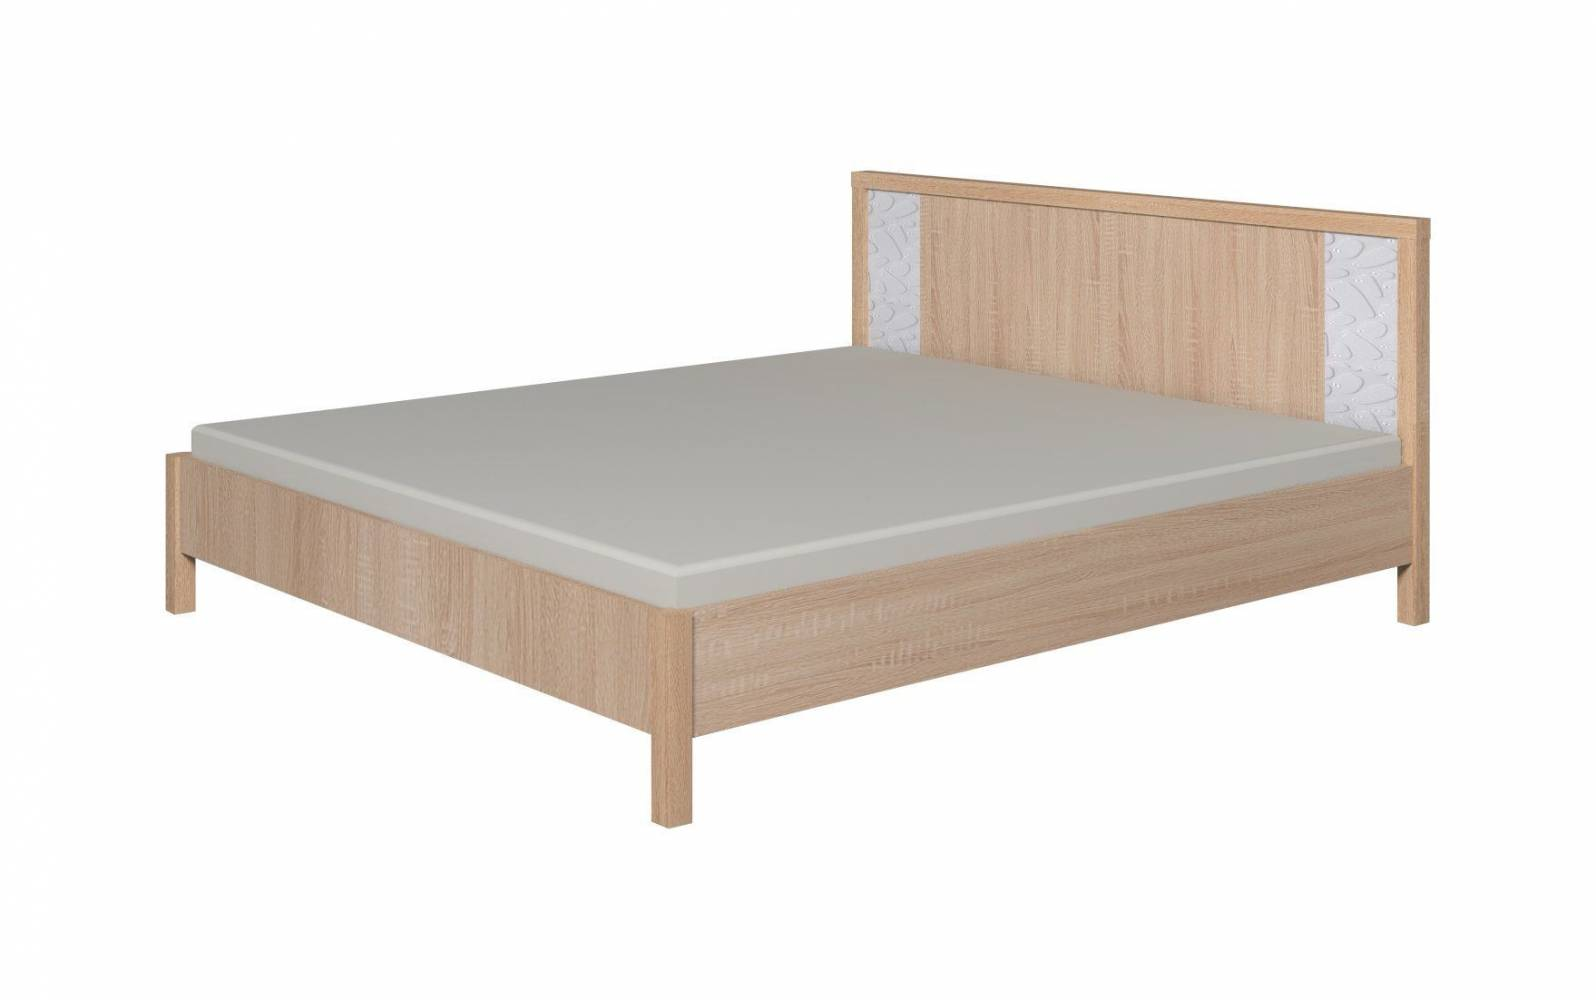 WYSPAA 21 Кровать 180, без основания, без матраса